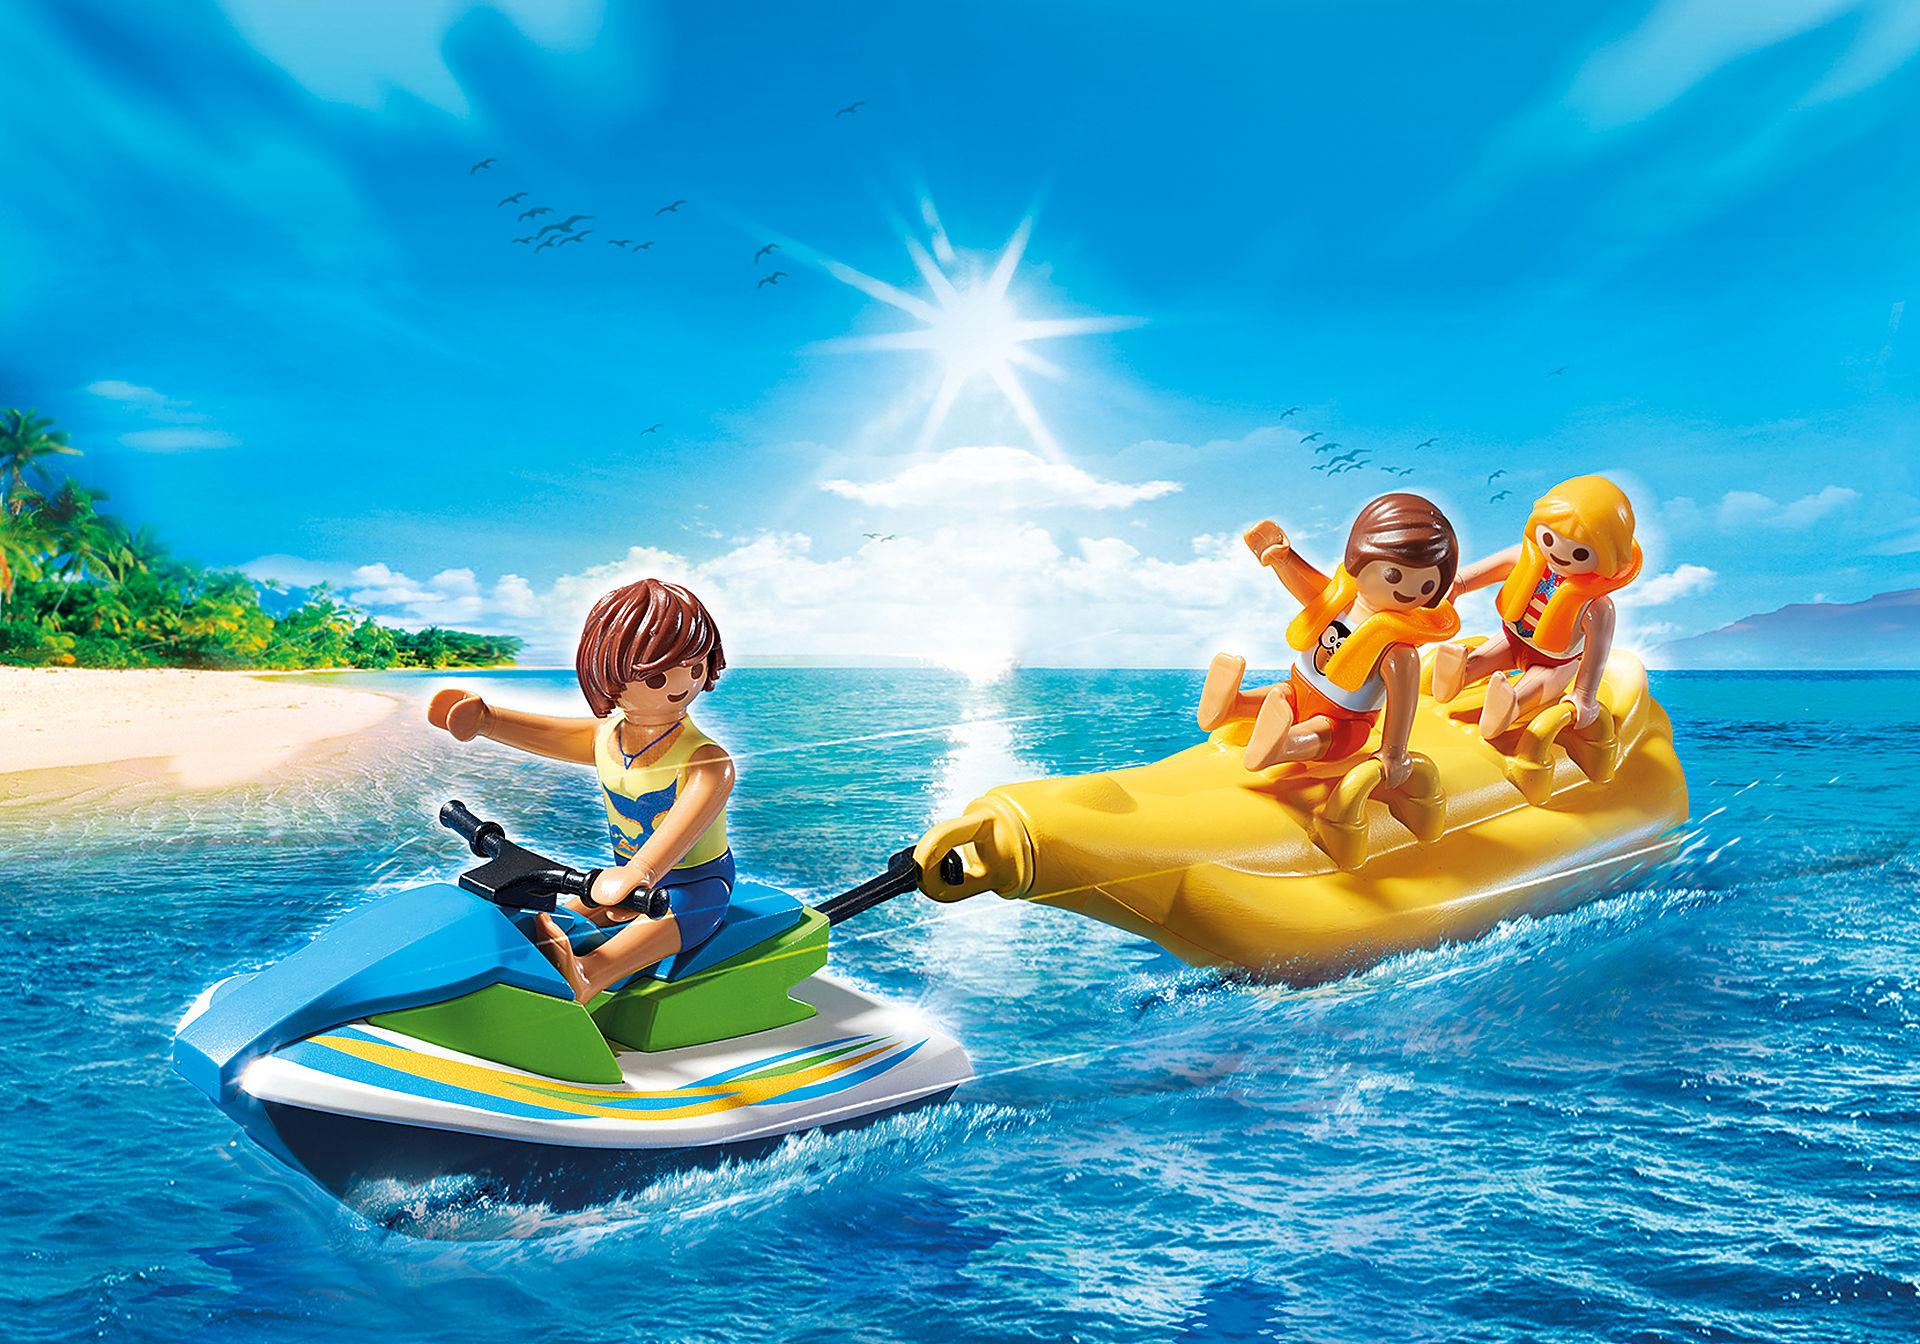 http://media.playmobil.com/i/playmobil/6980_product_detail/Skuter wodny z bananową łódką